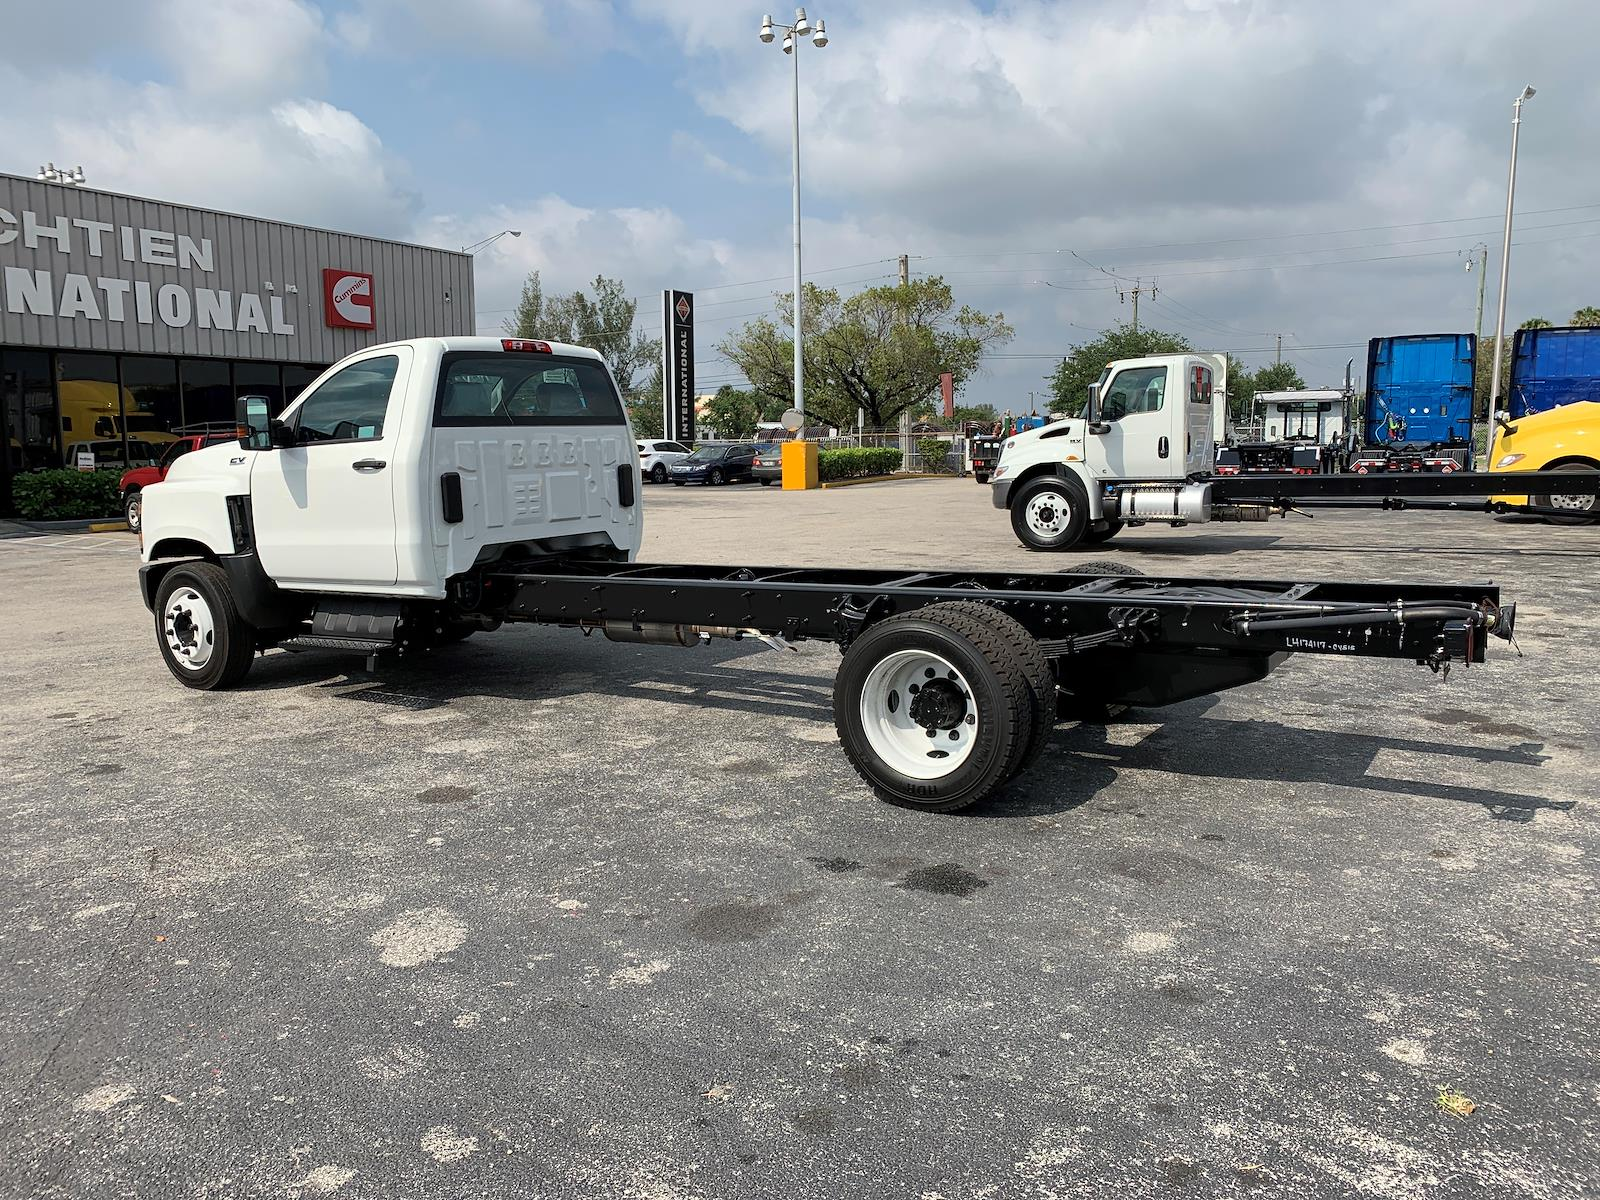 2021 International CV 4x4, Cab Chassis #PR-235450 - photo 1